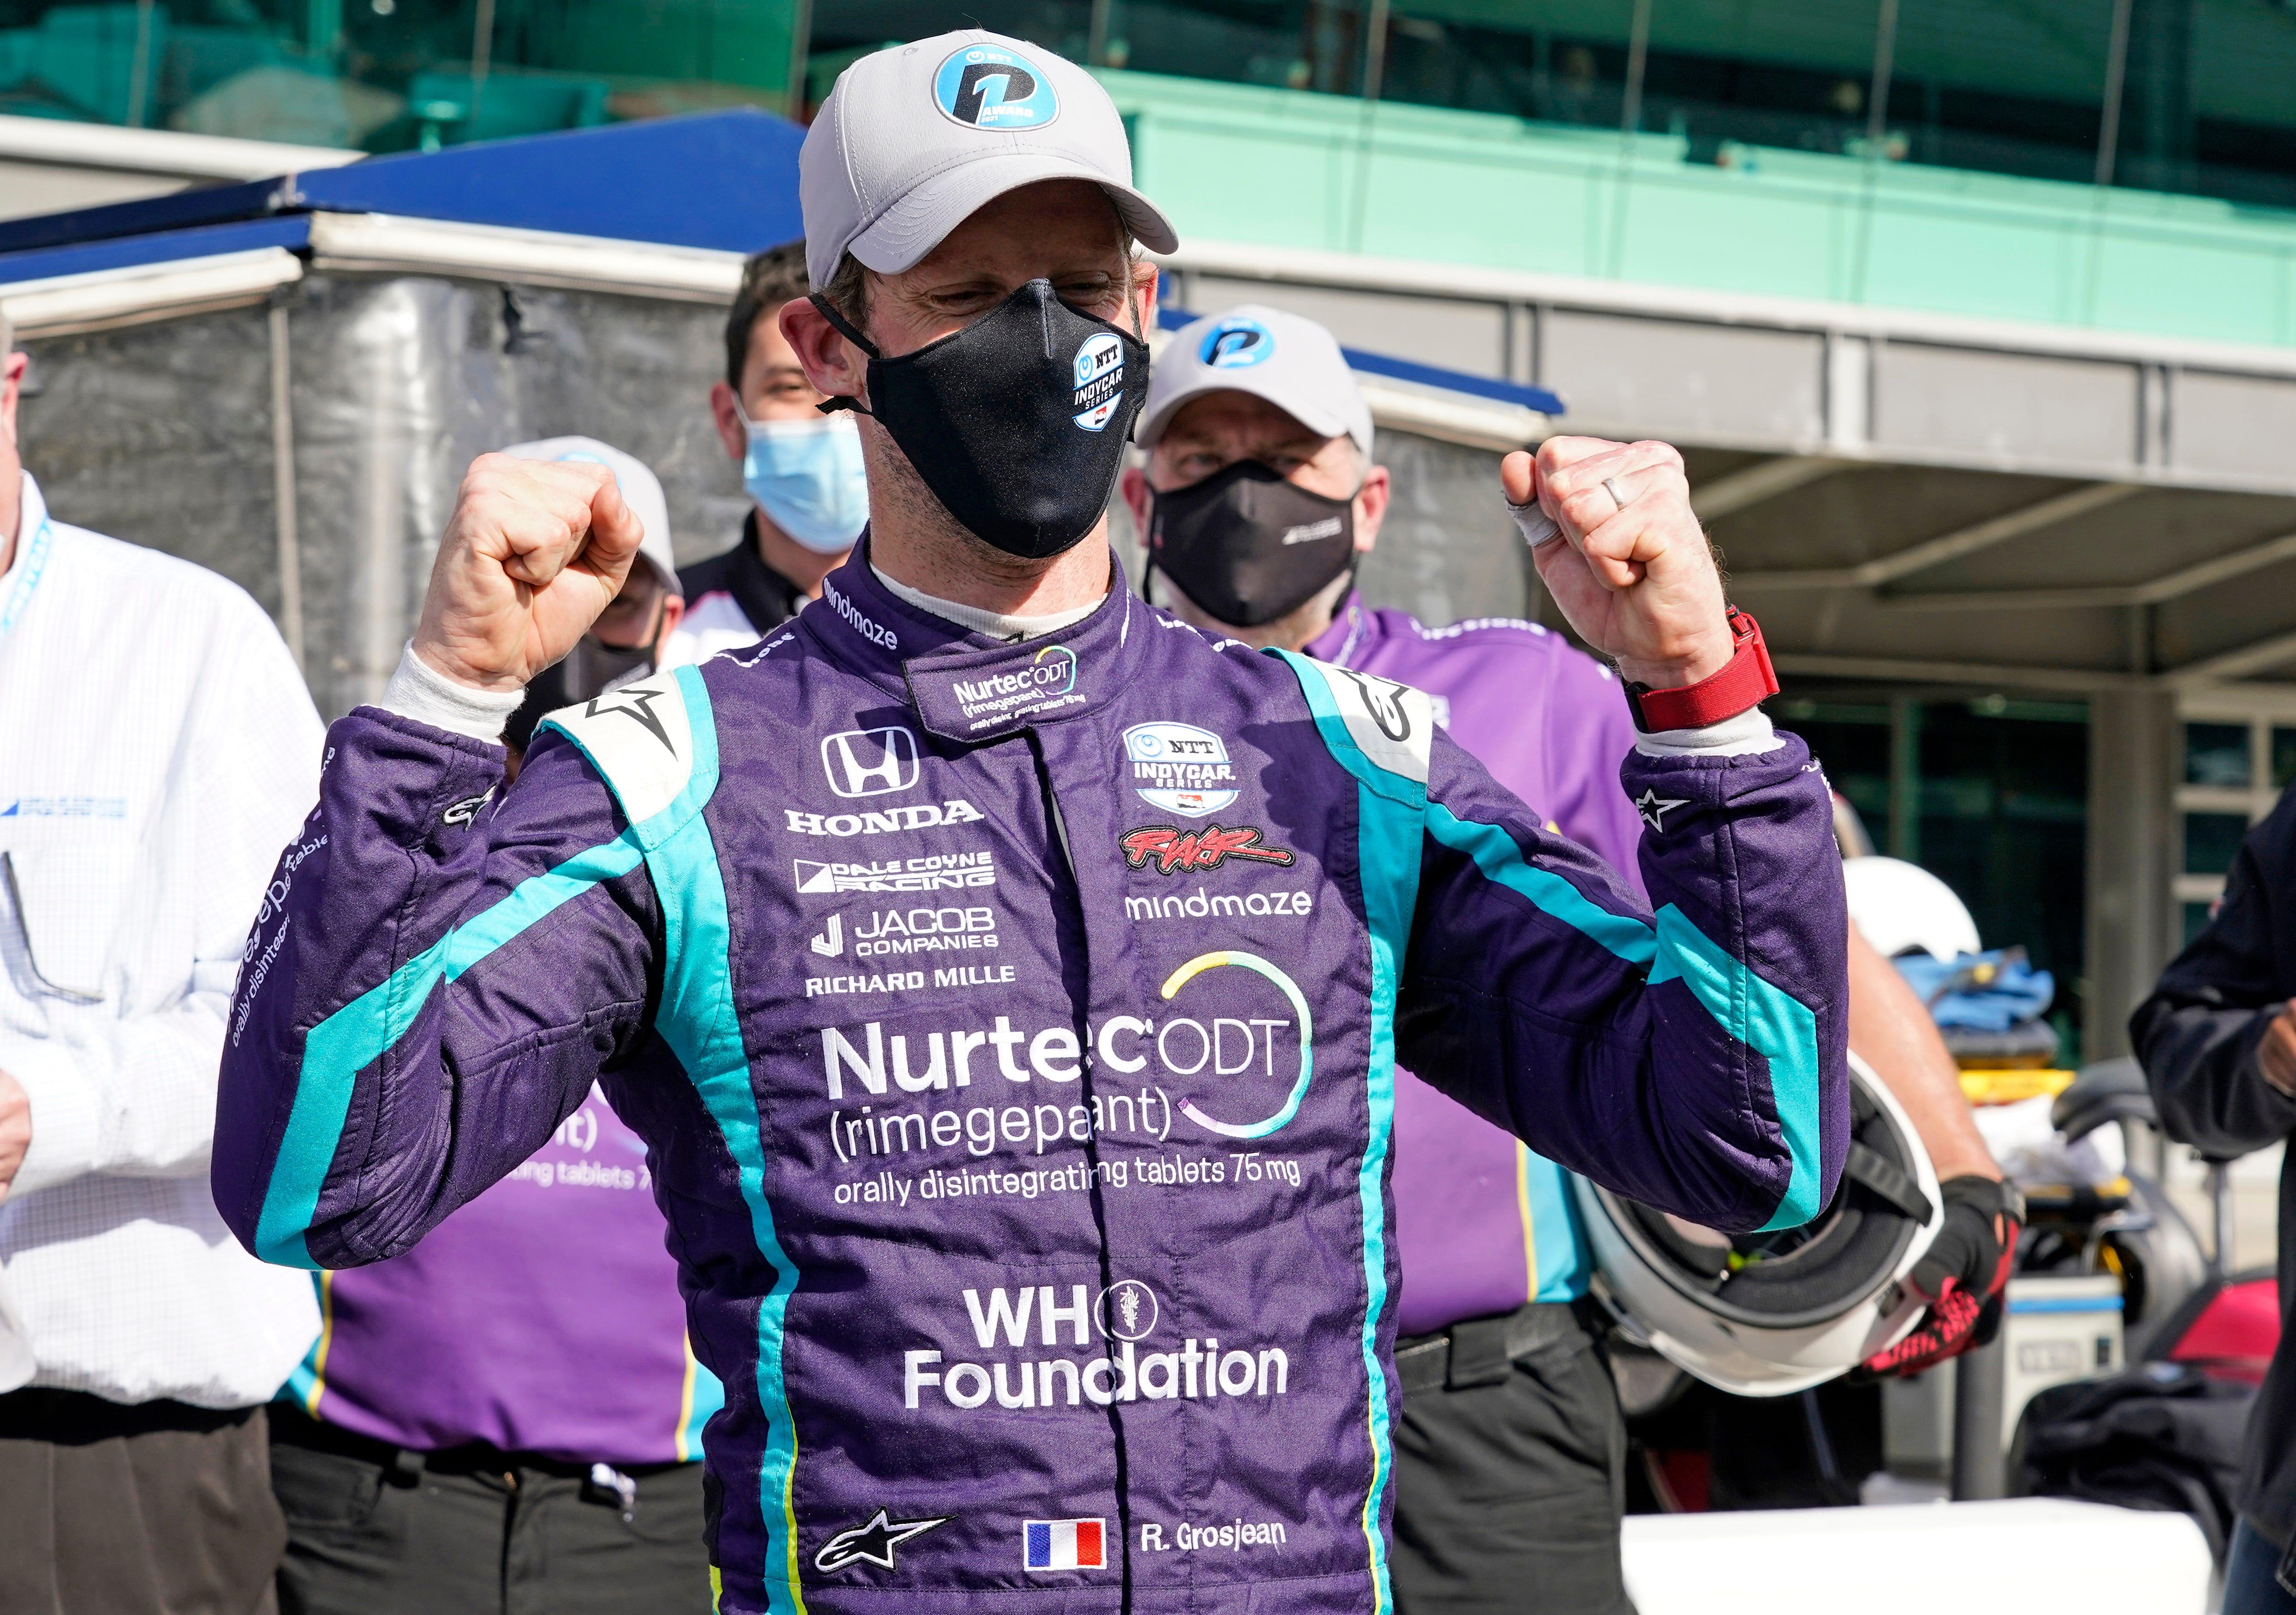 Rookie Grosjean takes GMR Grand Prix pole